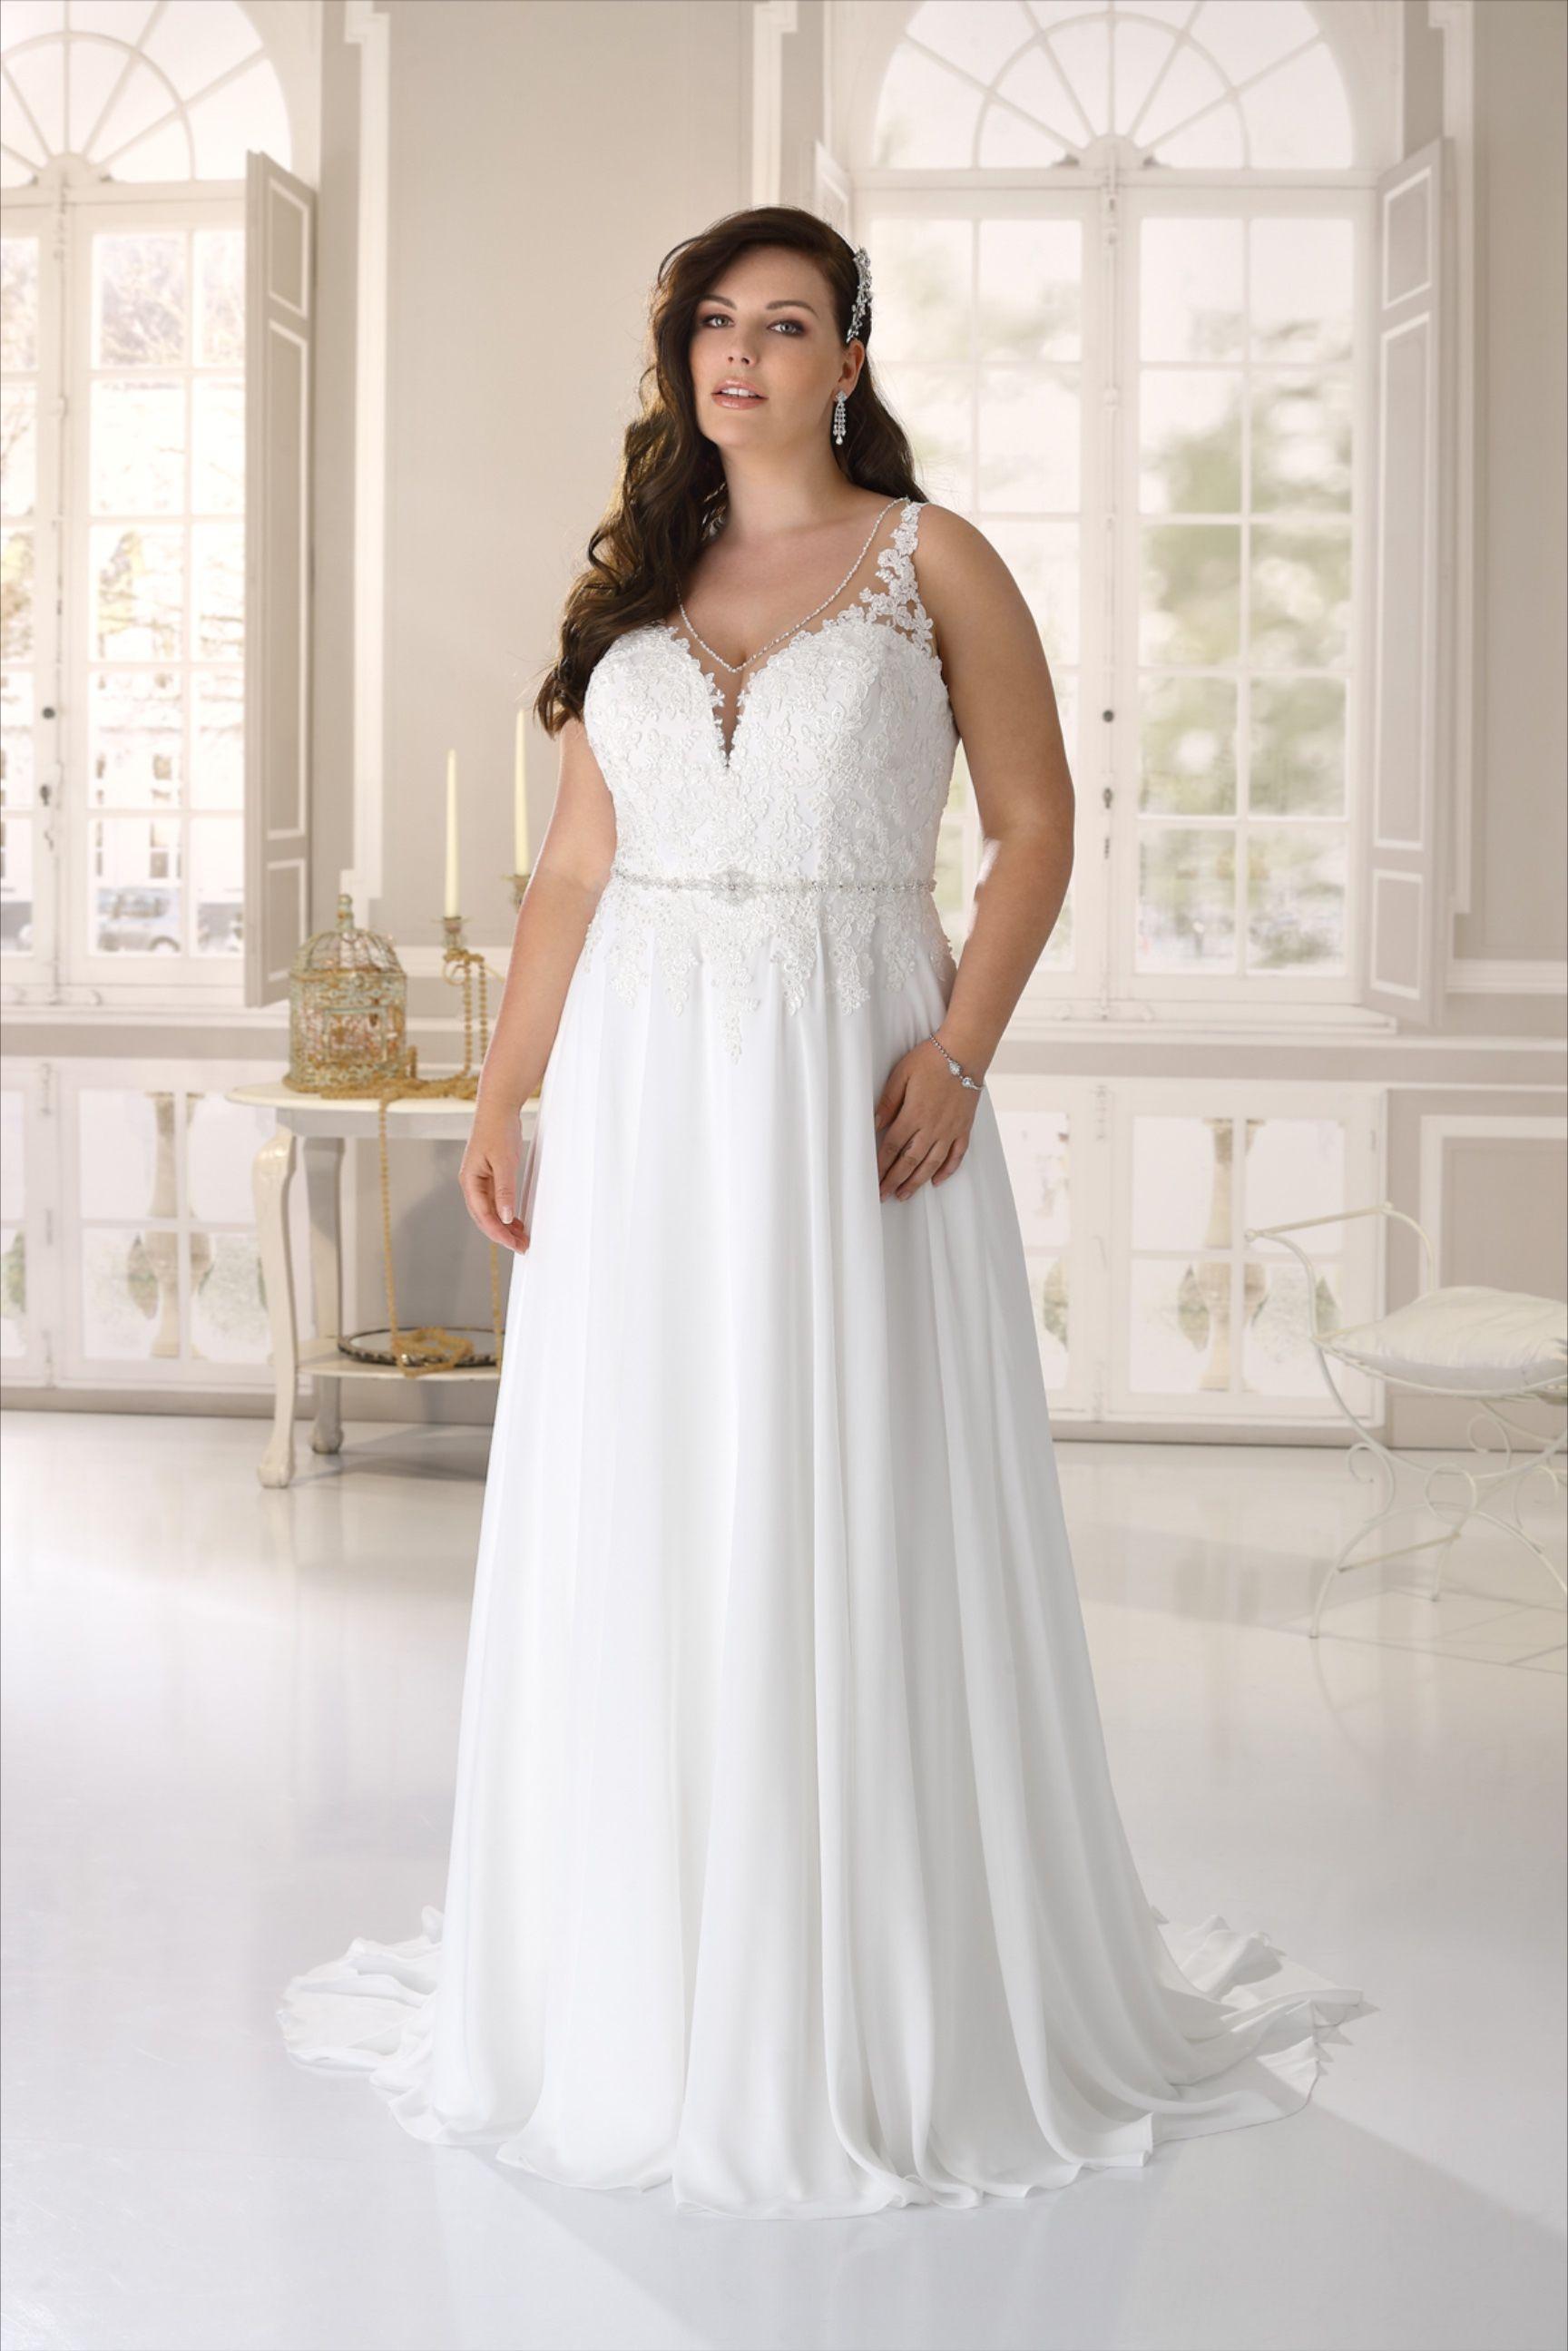 Ladybird Wedding Dress Style LS721002 in 2020 Wedding